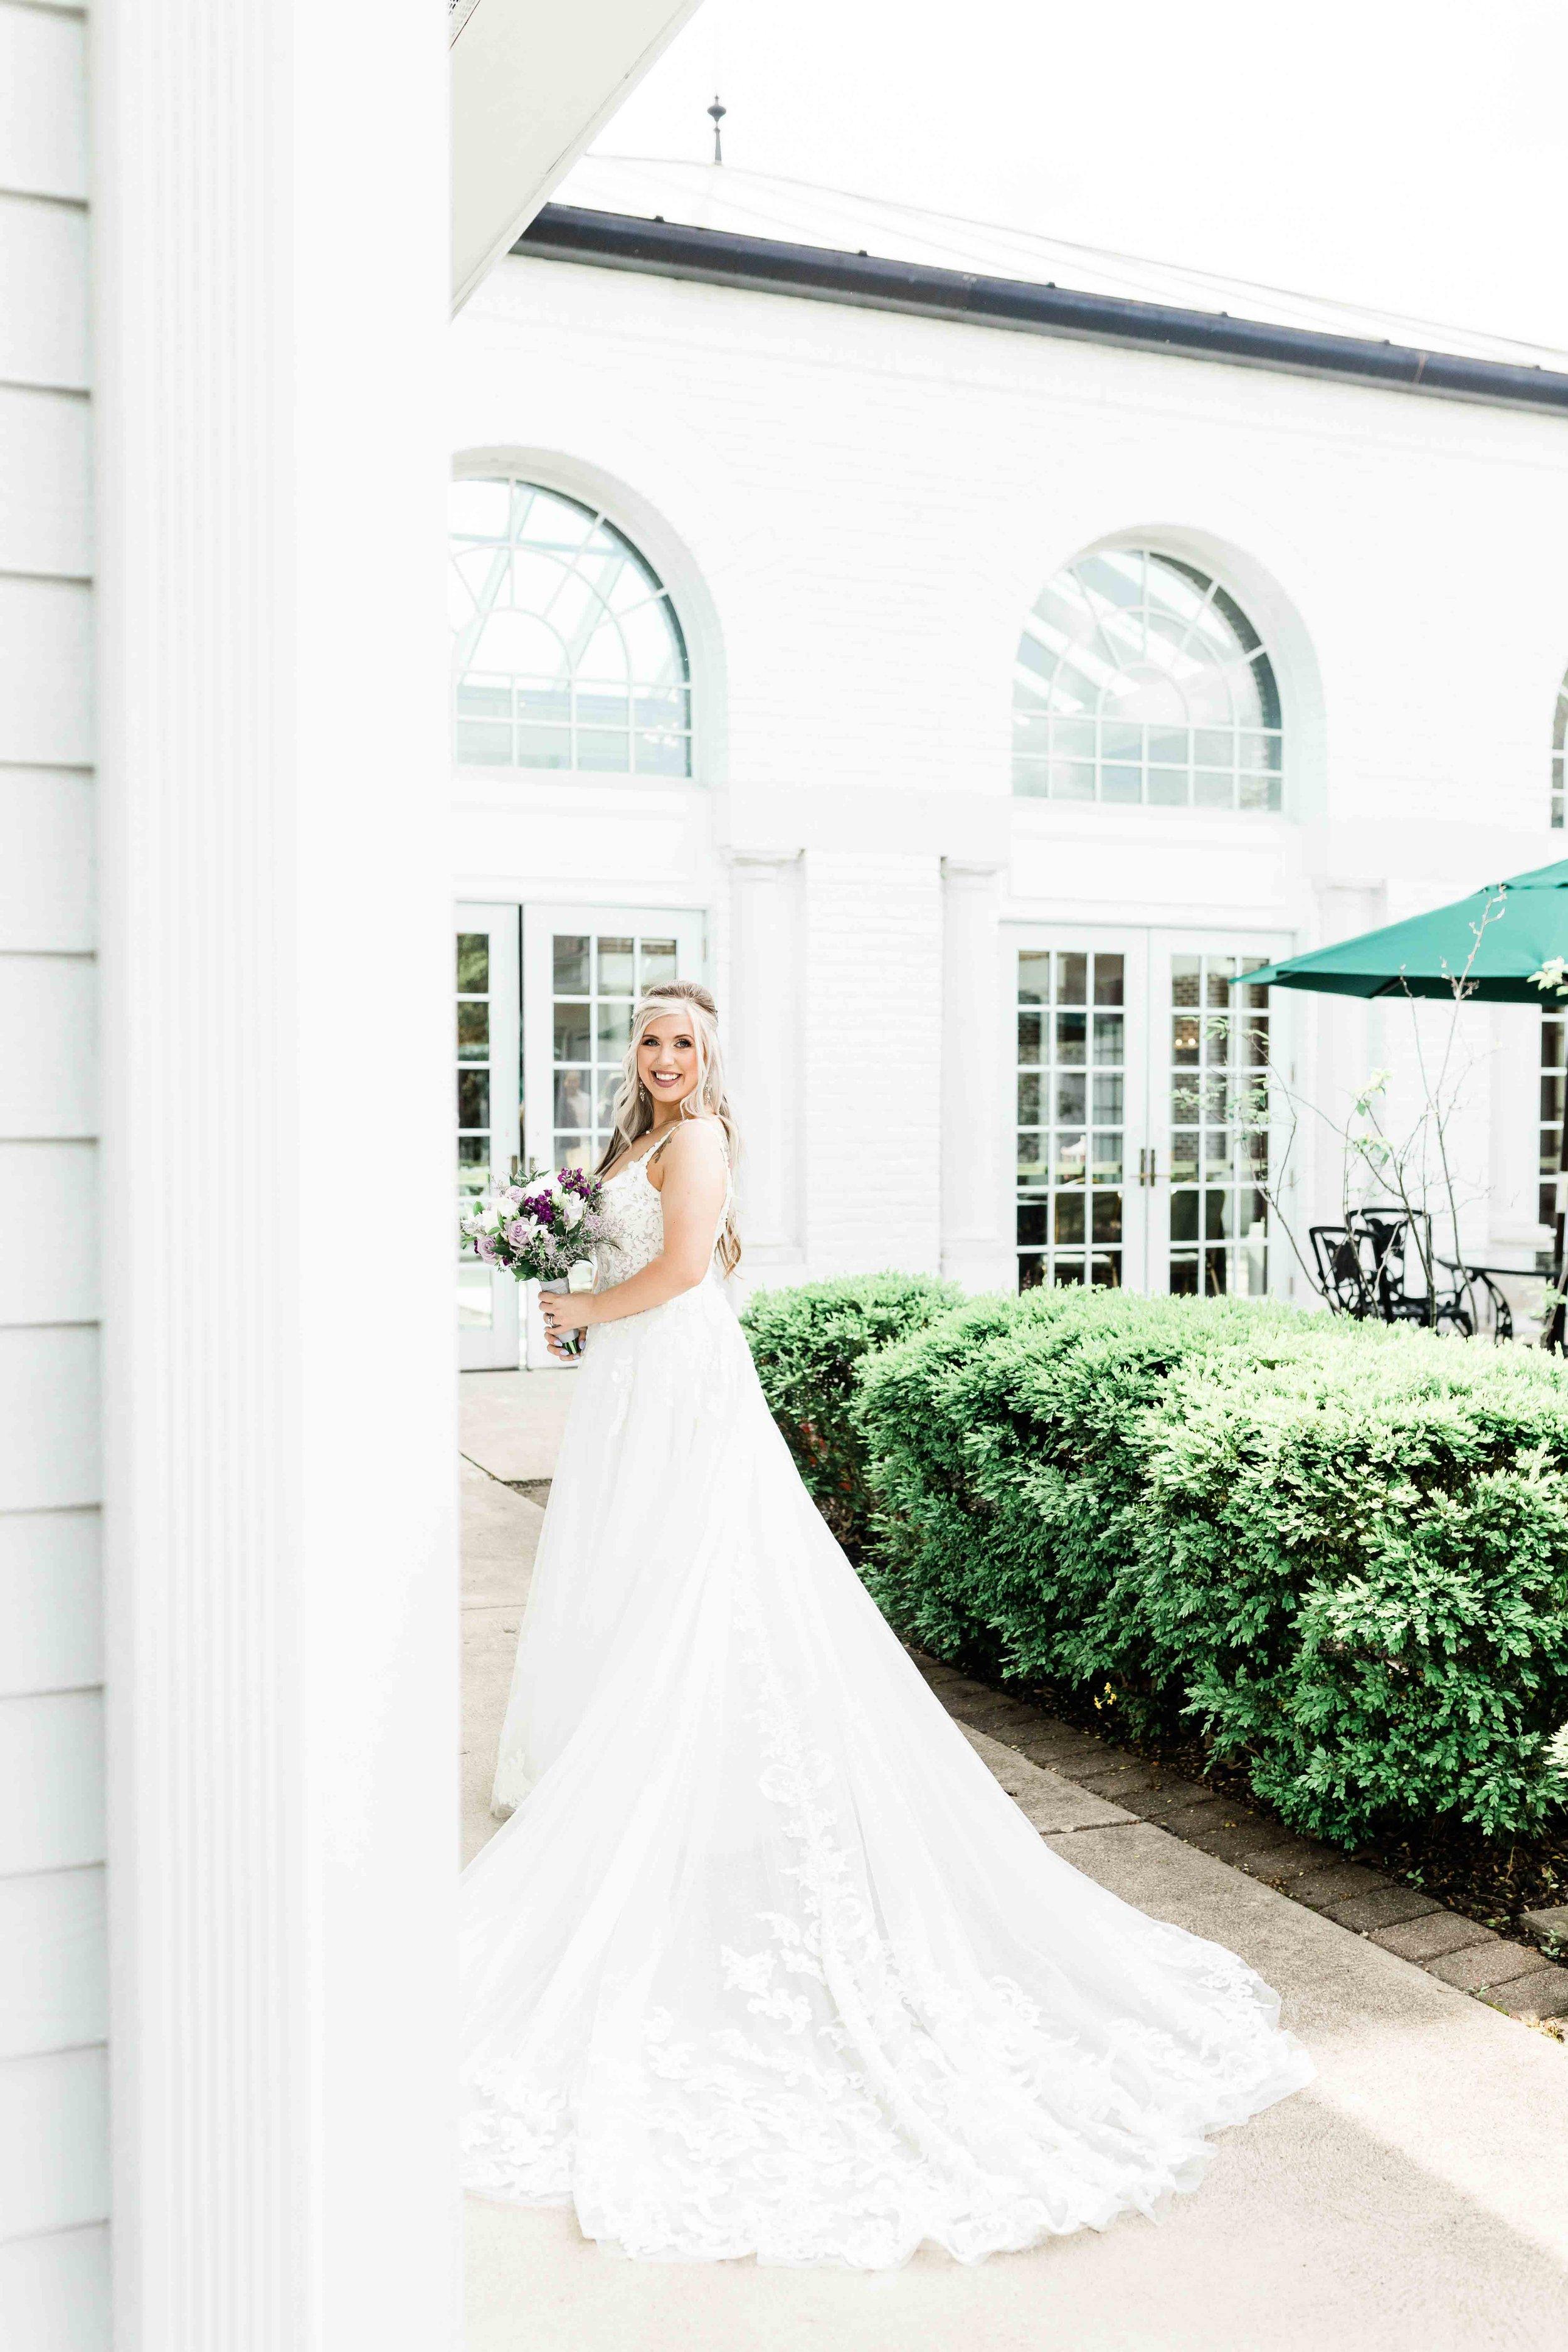 wedding photographers nky southwest ohio cincinnati dayton-1.jpg